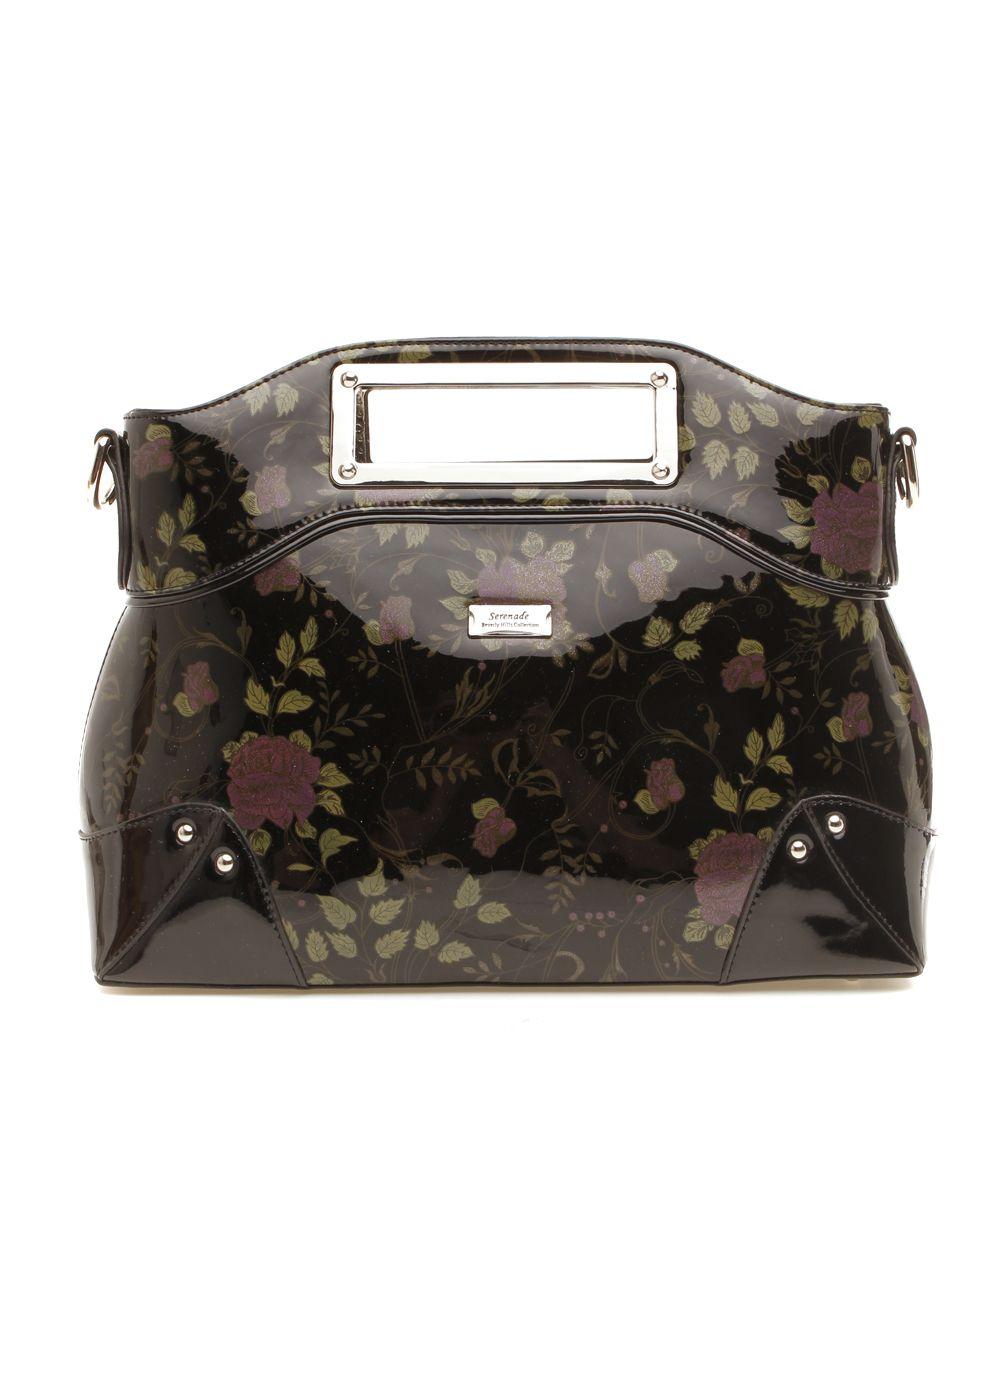 Black Vintage Rose Print Leather Handbag Leather Handbags Handbag Leather